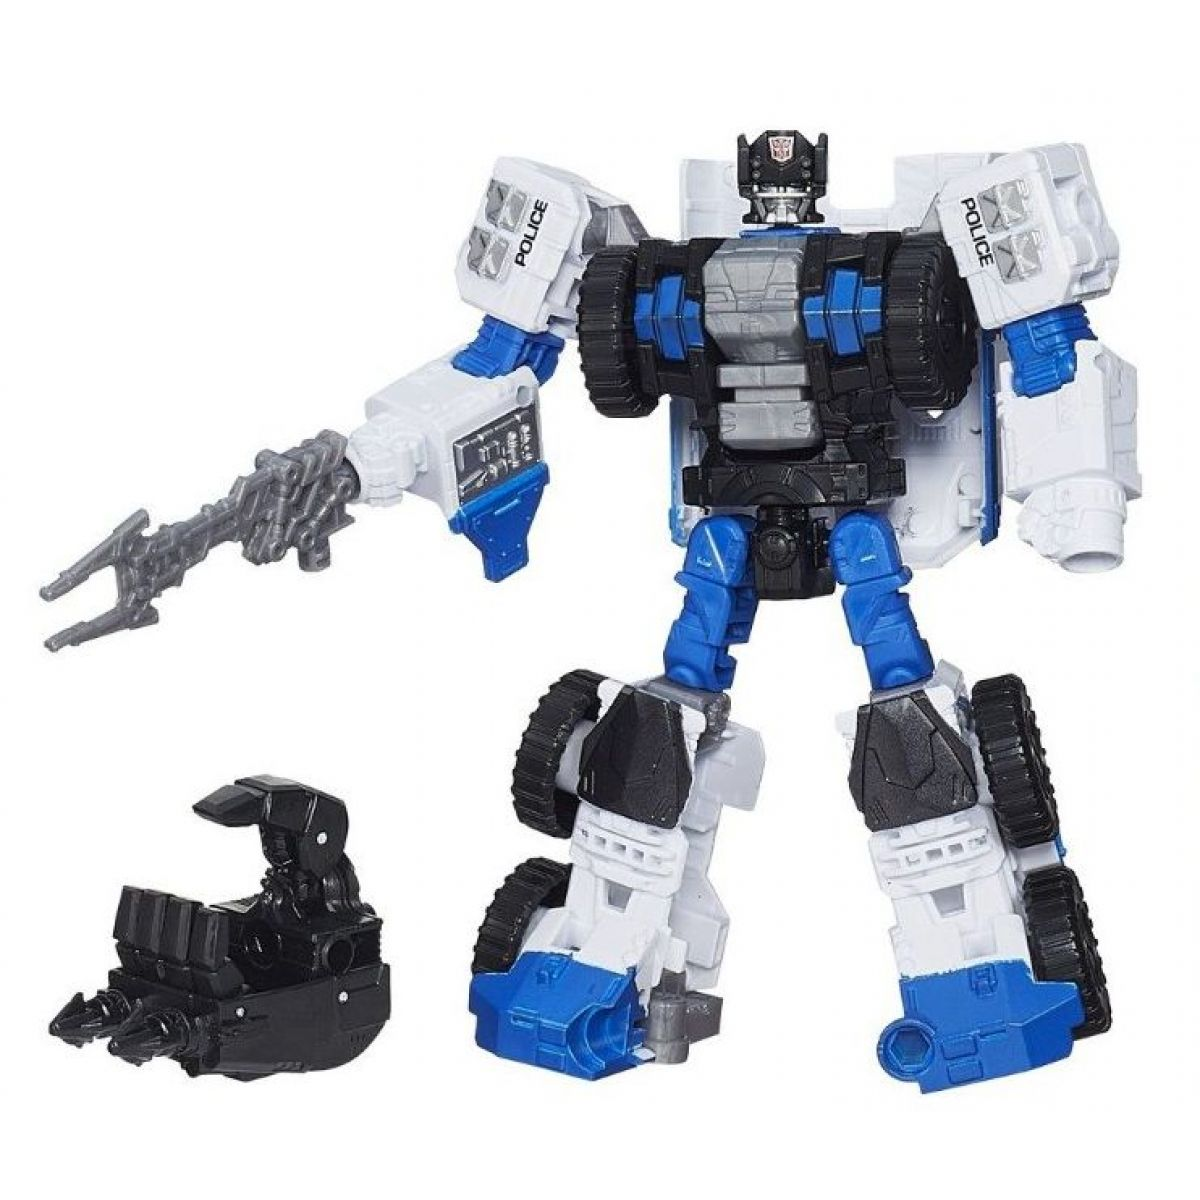 Hasbro Transformers pohyblivý Transformer s vylepšením - Rook